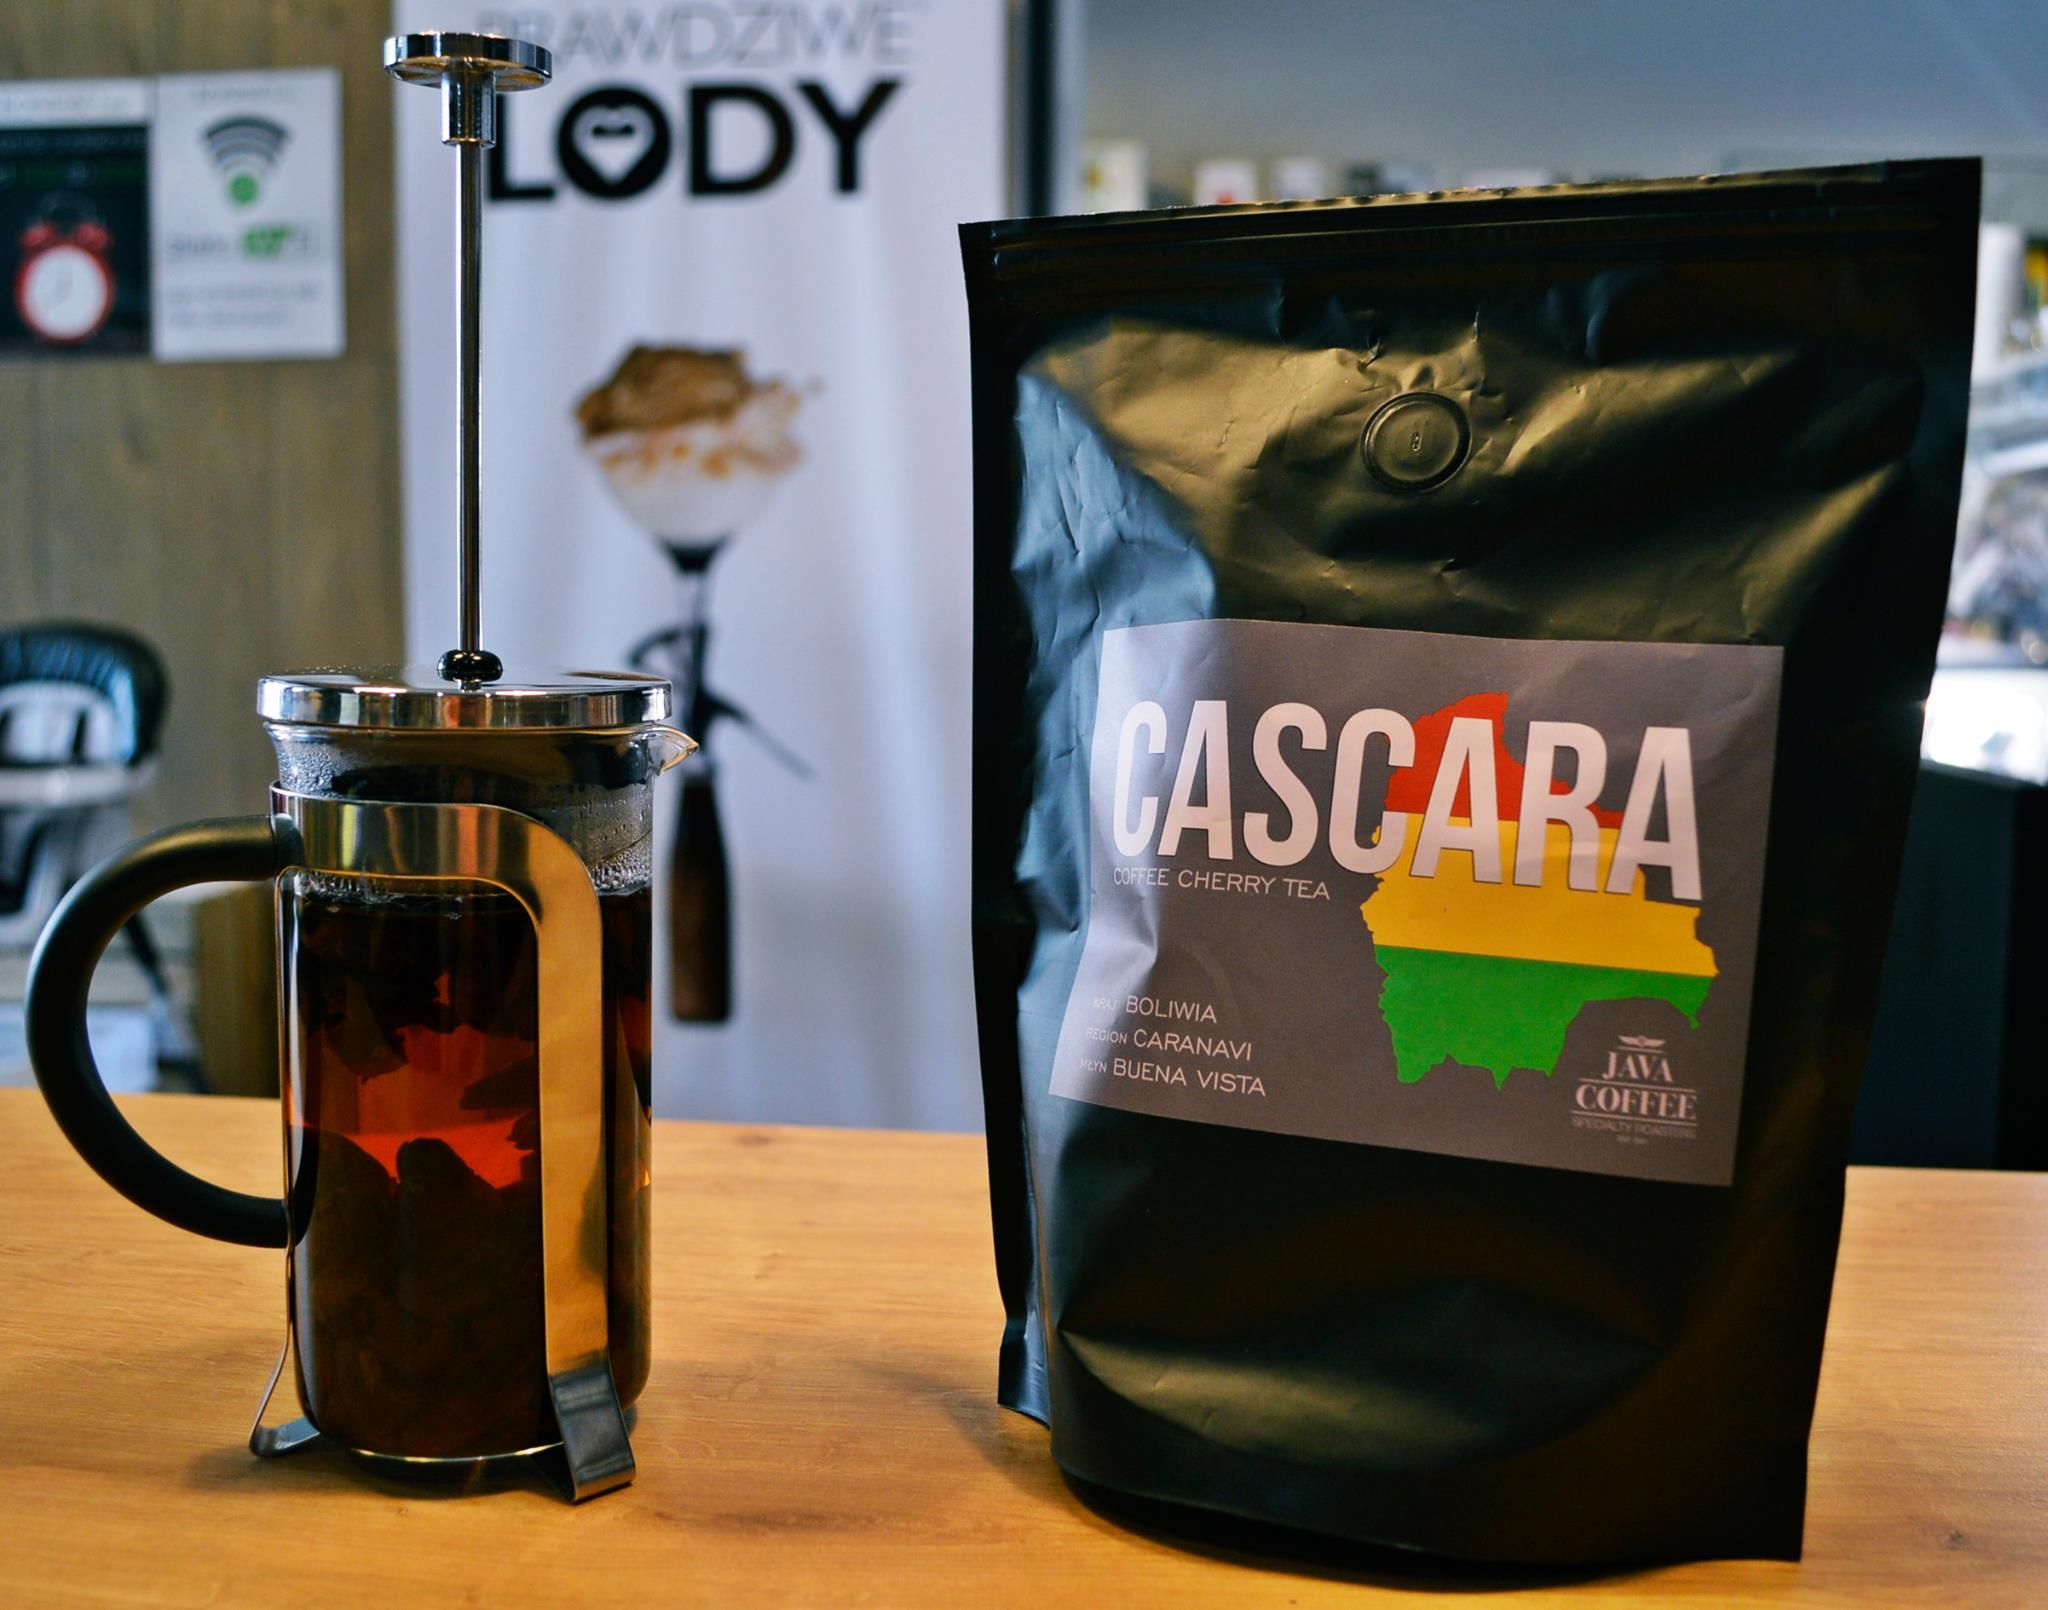 Cascara - herbata z kawy?